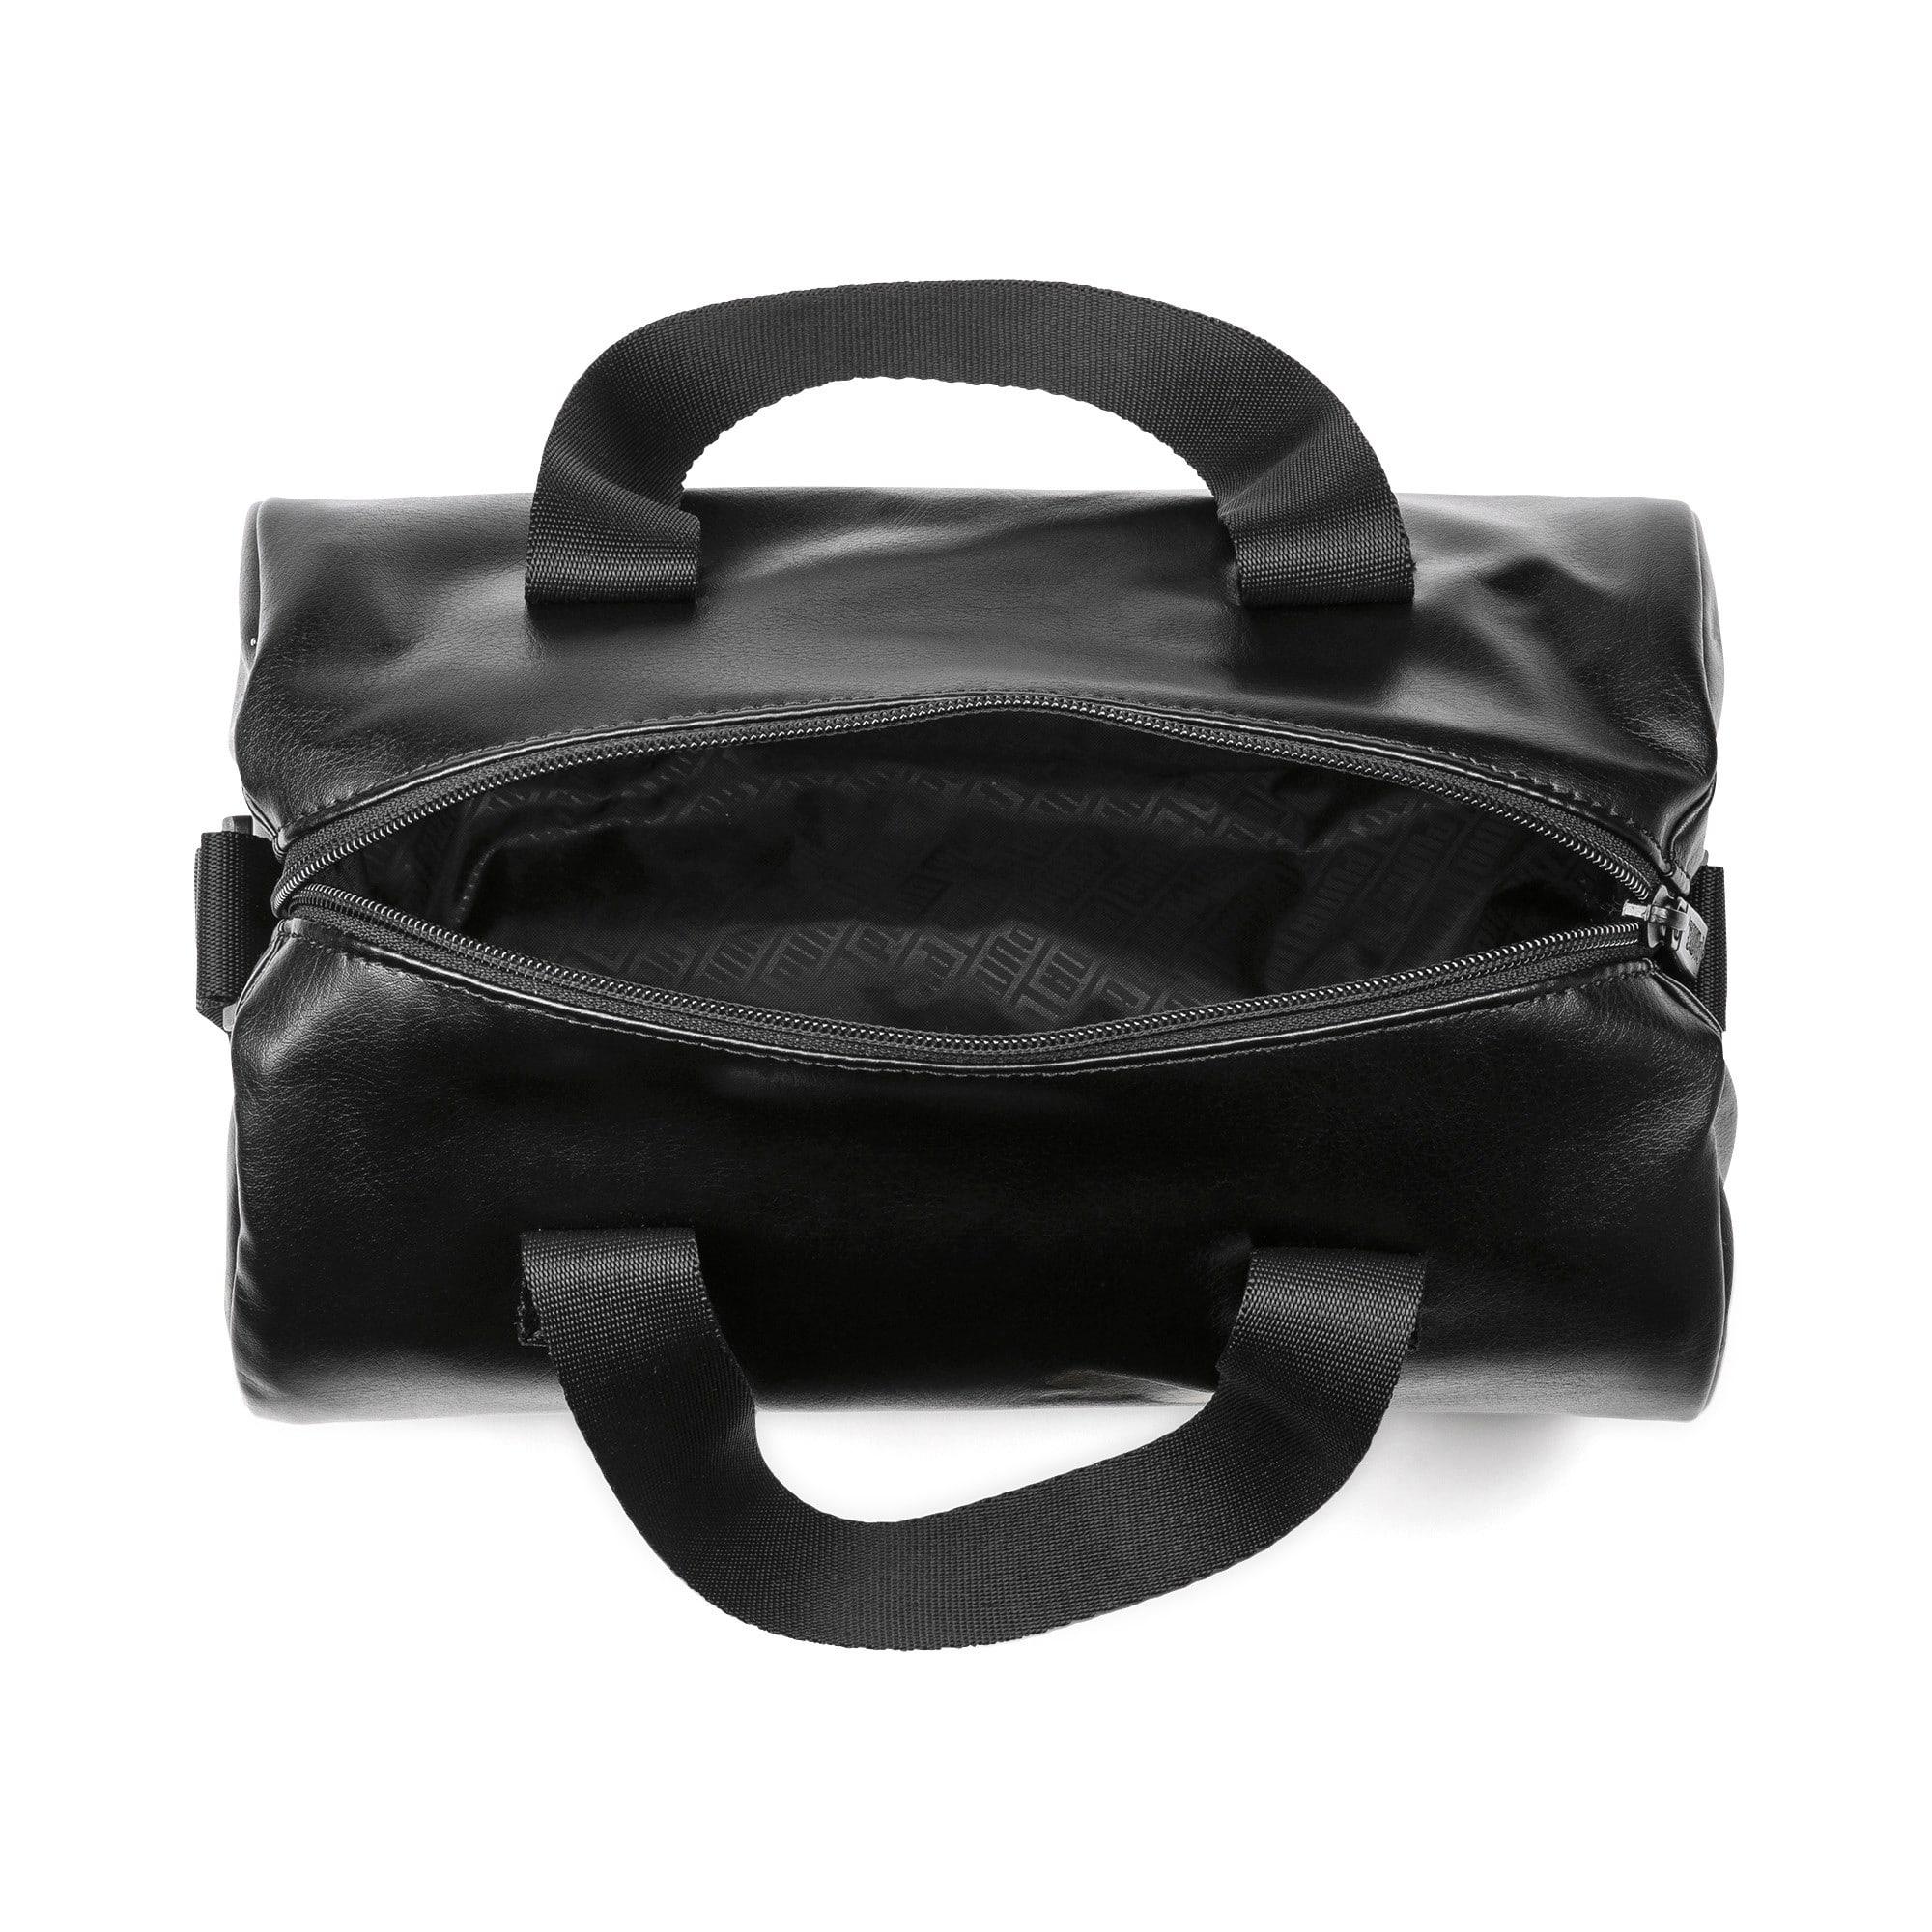 Thumbnail 4 of Up Women's Handbag, Puma Black-Gold, medium-IND